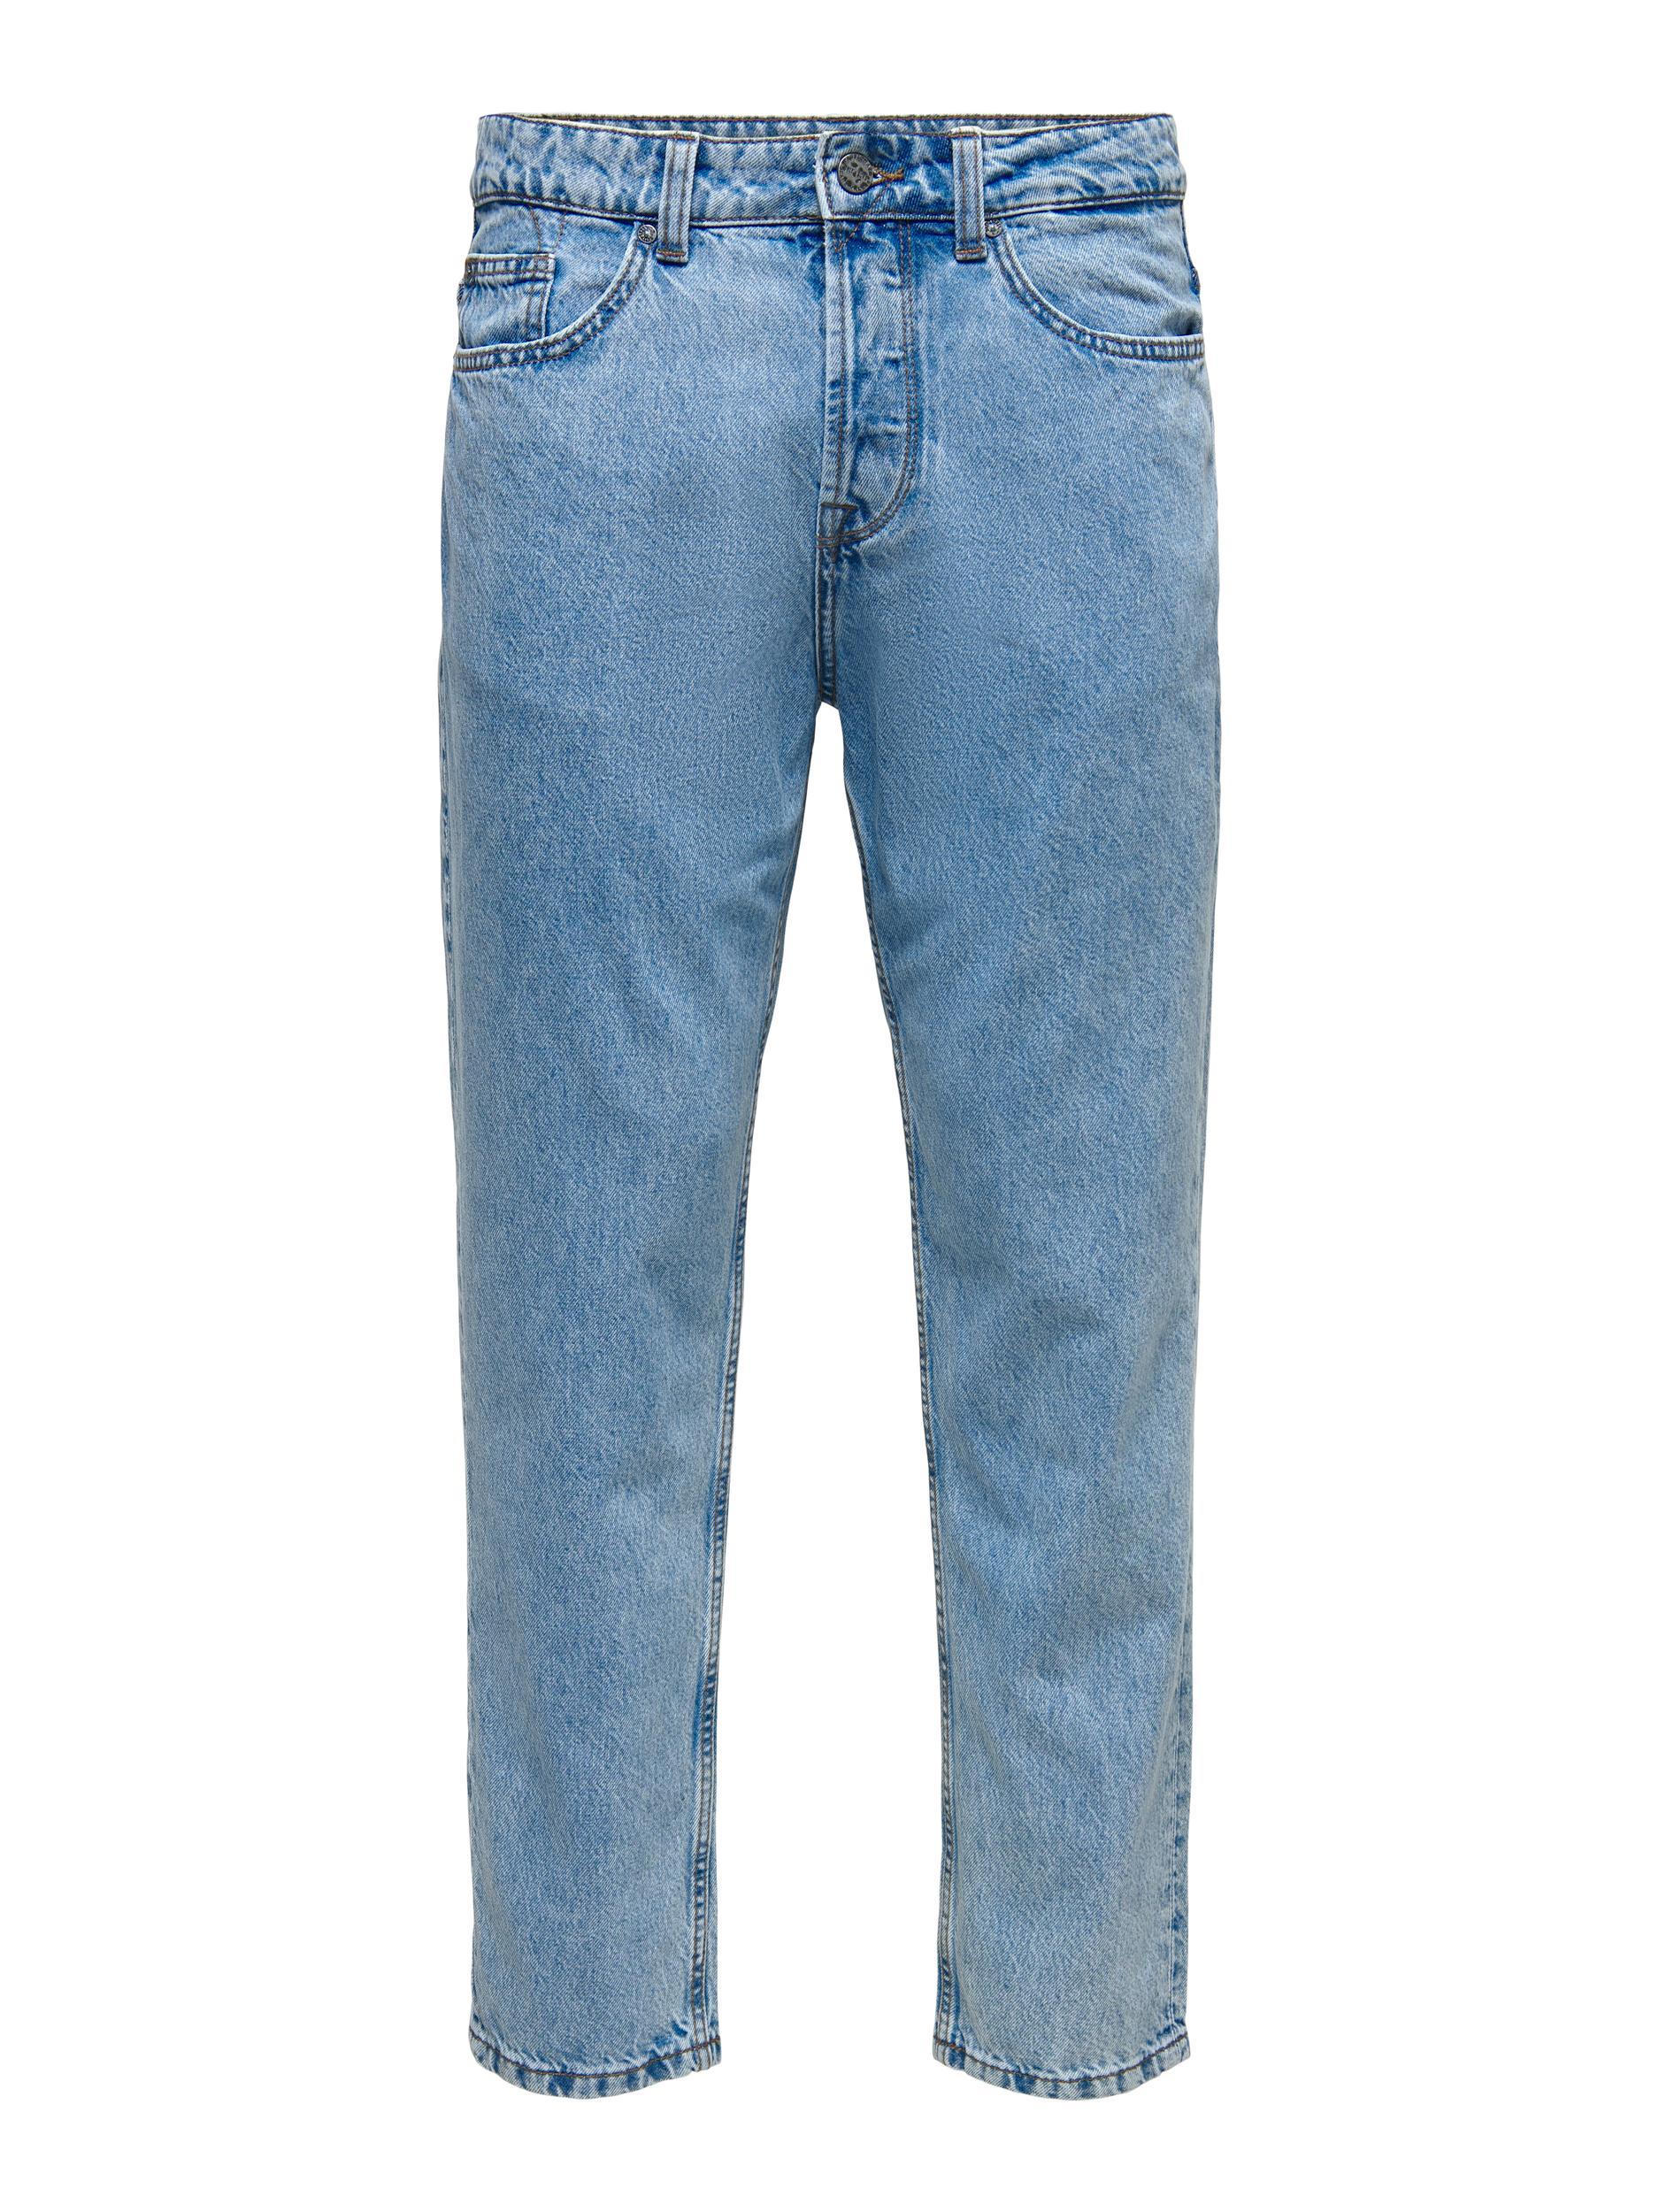 Only & Sons Avi Beam Life Crop Jeans, Blue Denim, W28/L32